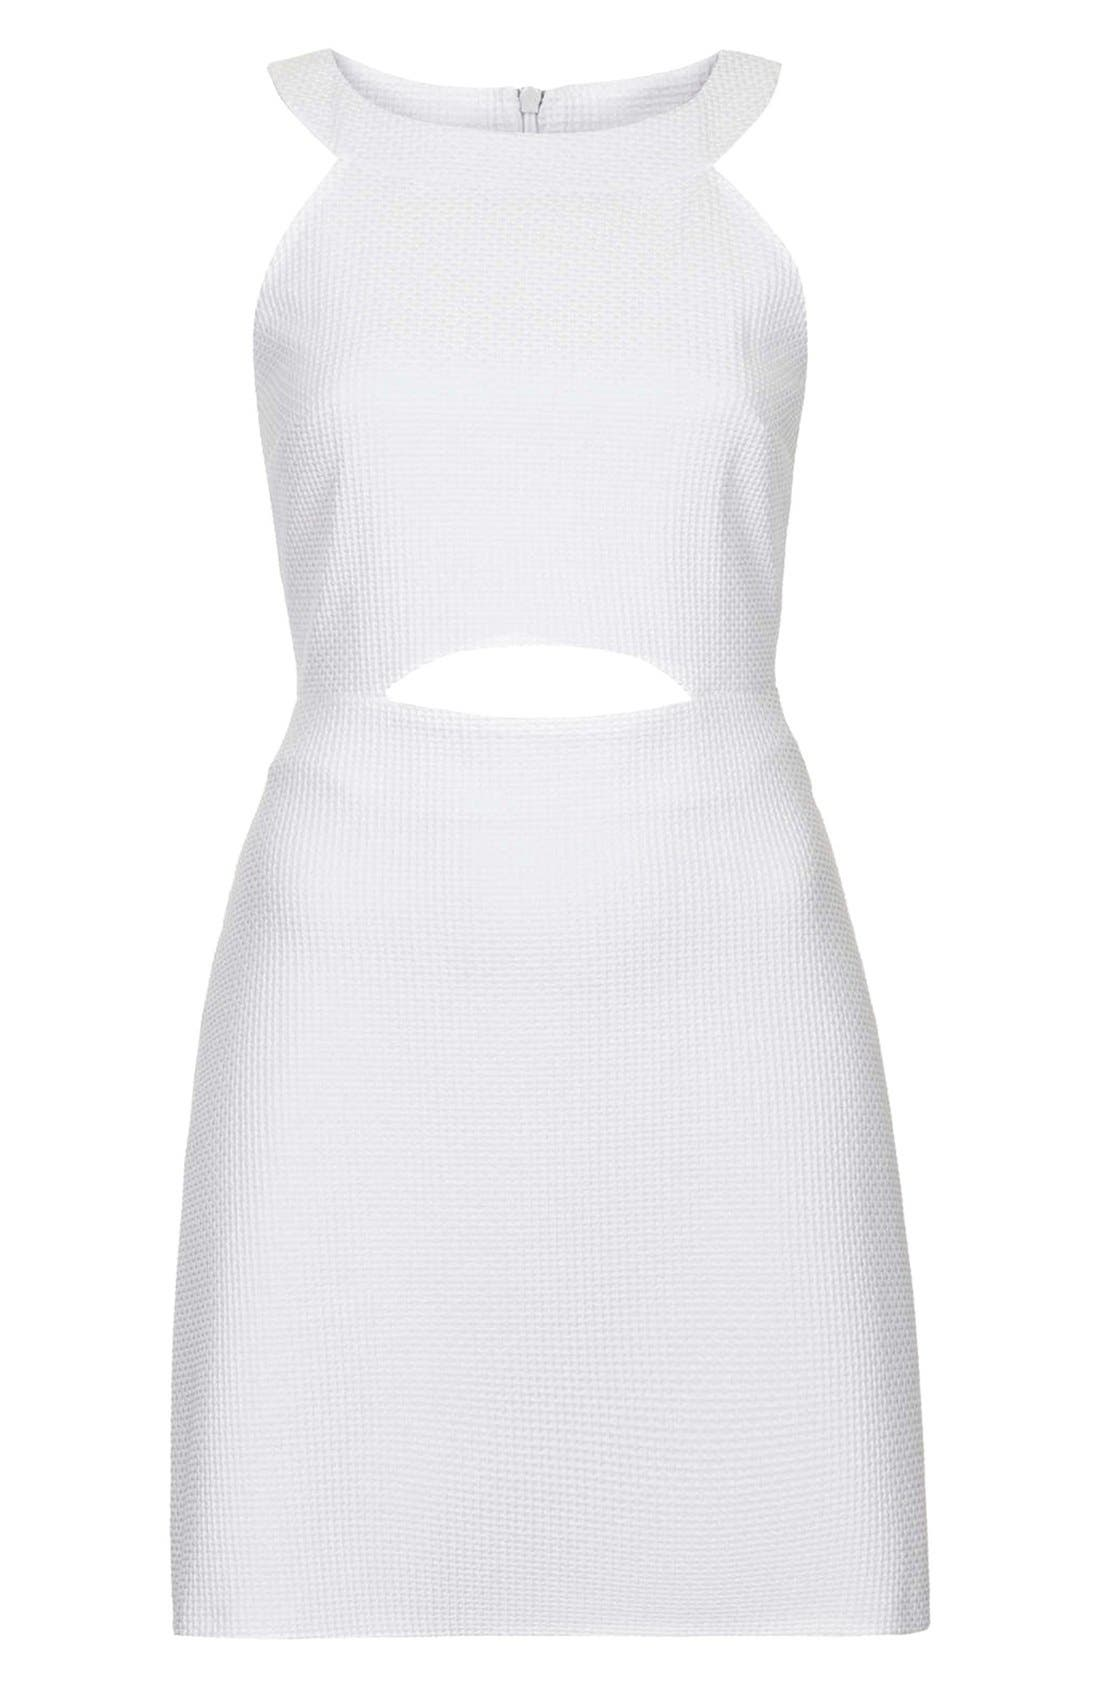 Alternate Image 3  - Topshop Cutout Textured Skater Dress